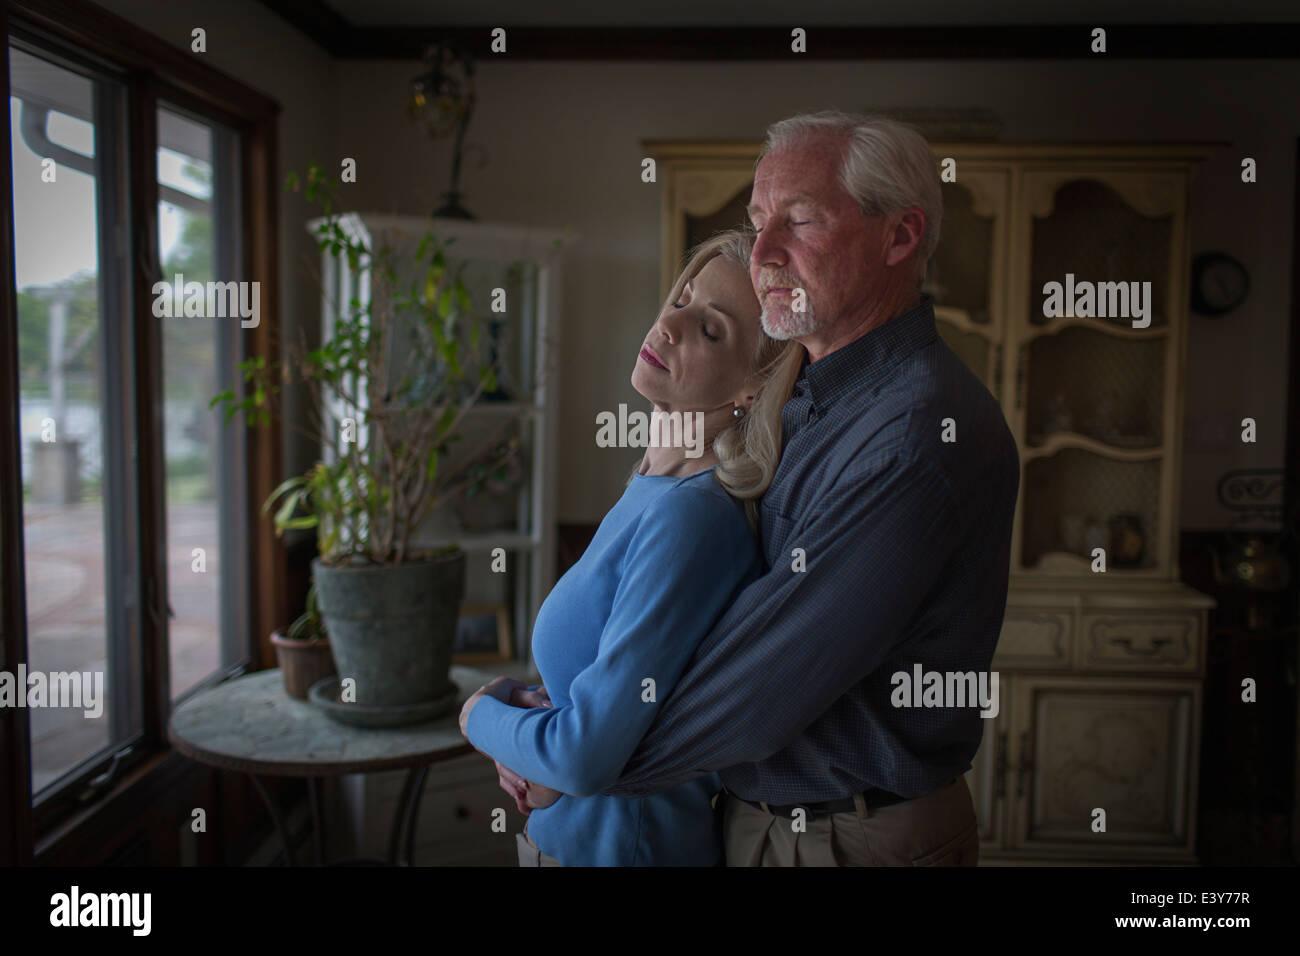 Romantische älteres paar umarmt mit Augen geschlossen im Speisesaal Stockbild